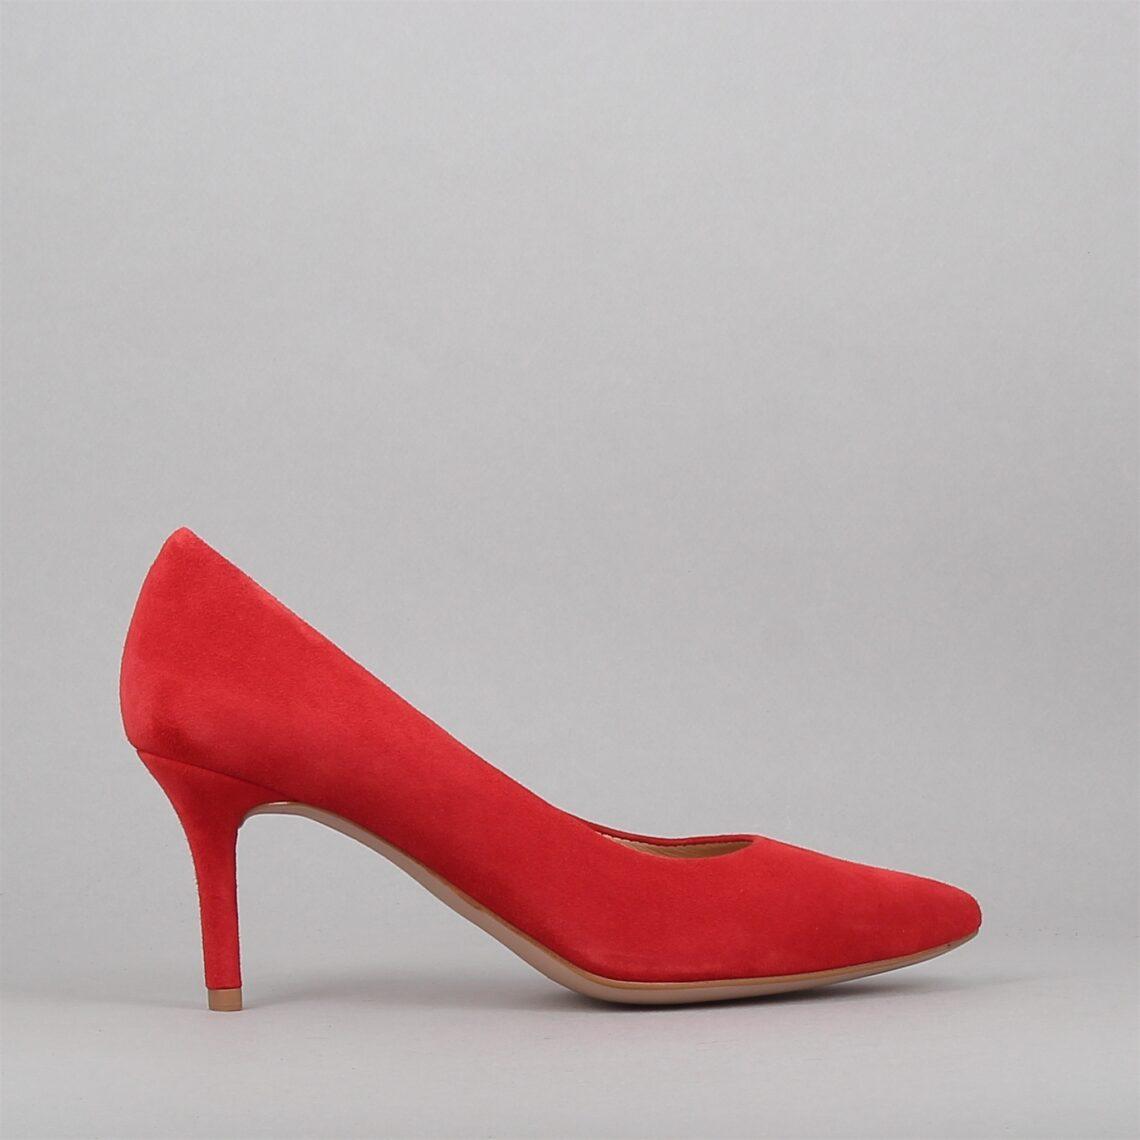 karace-rouge-176242690-0.jpg